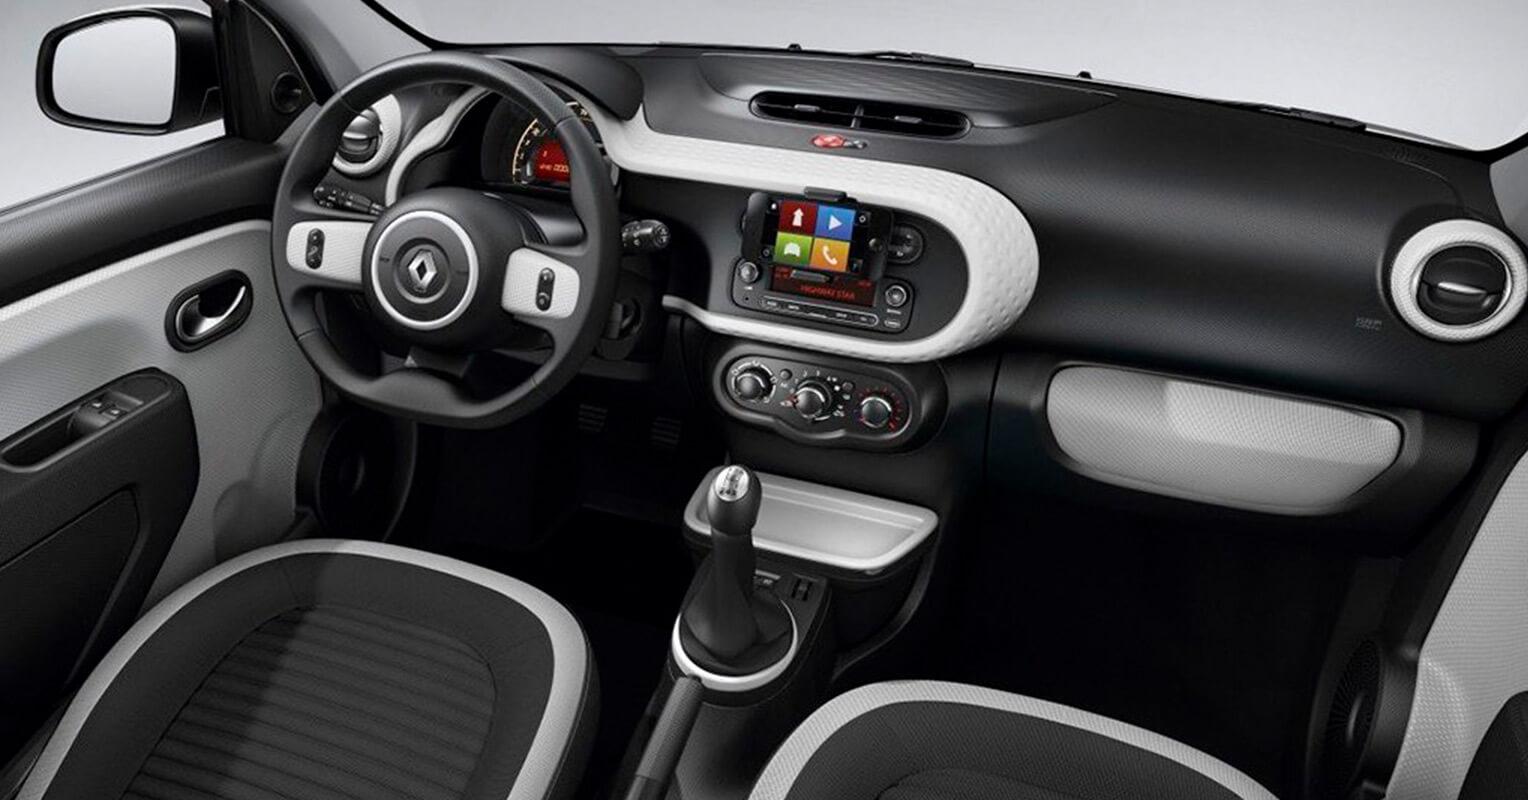 Renault Twingo 2018 interior